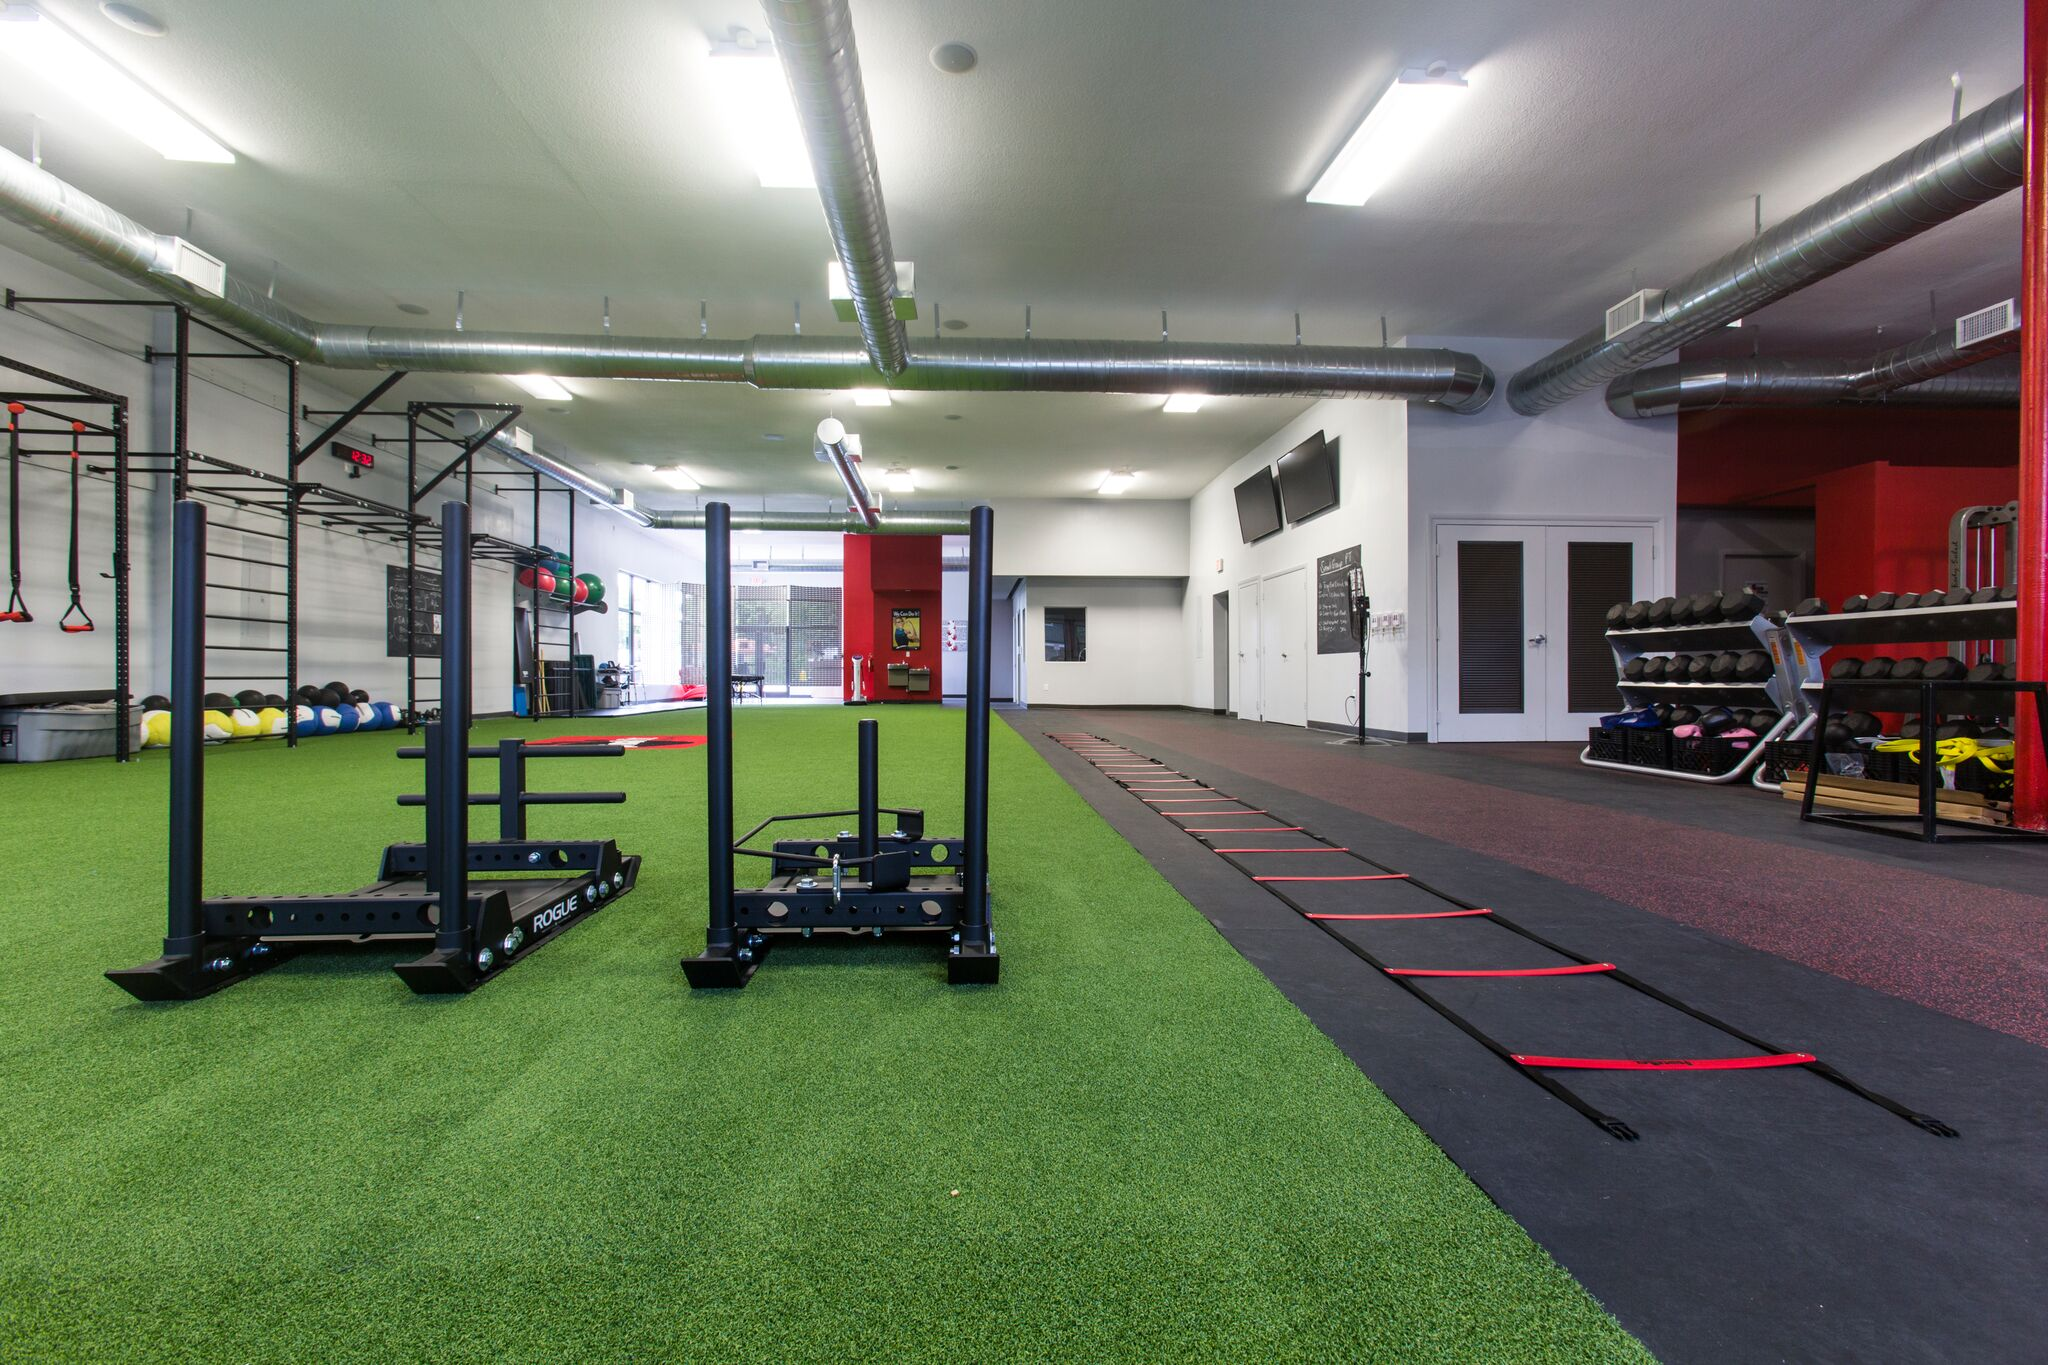 Primal Fit Miami: Personal Training + the Pro Athlete Treatment